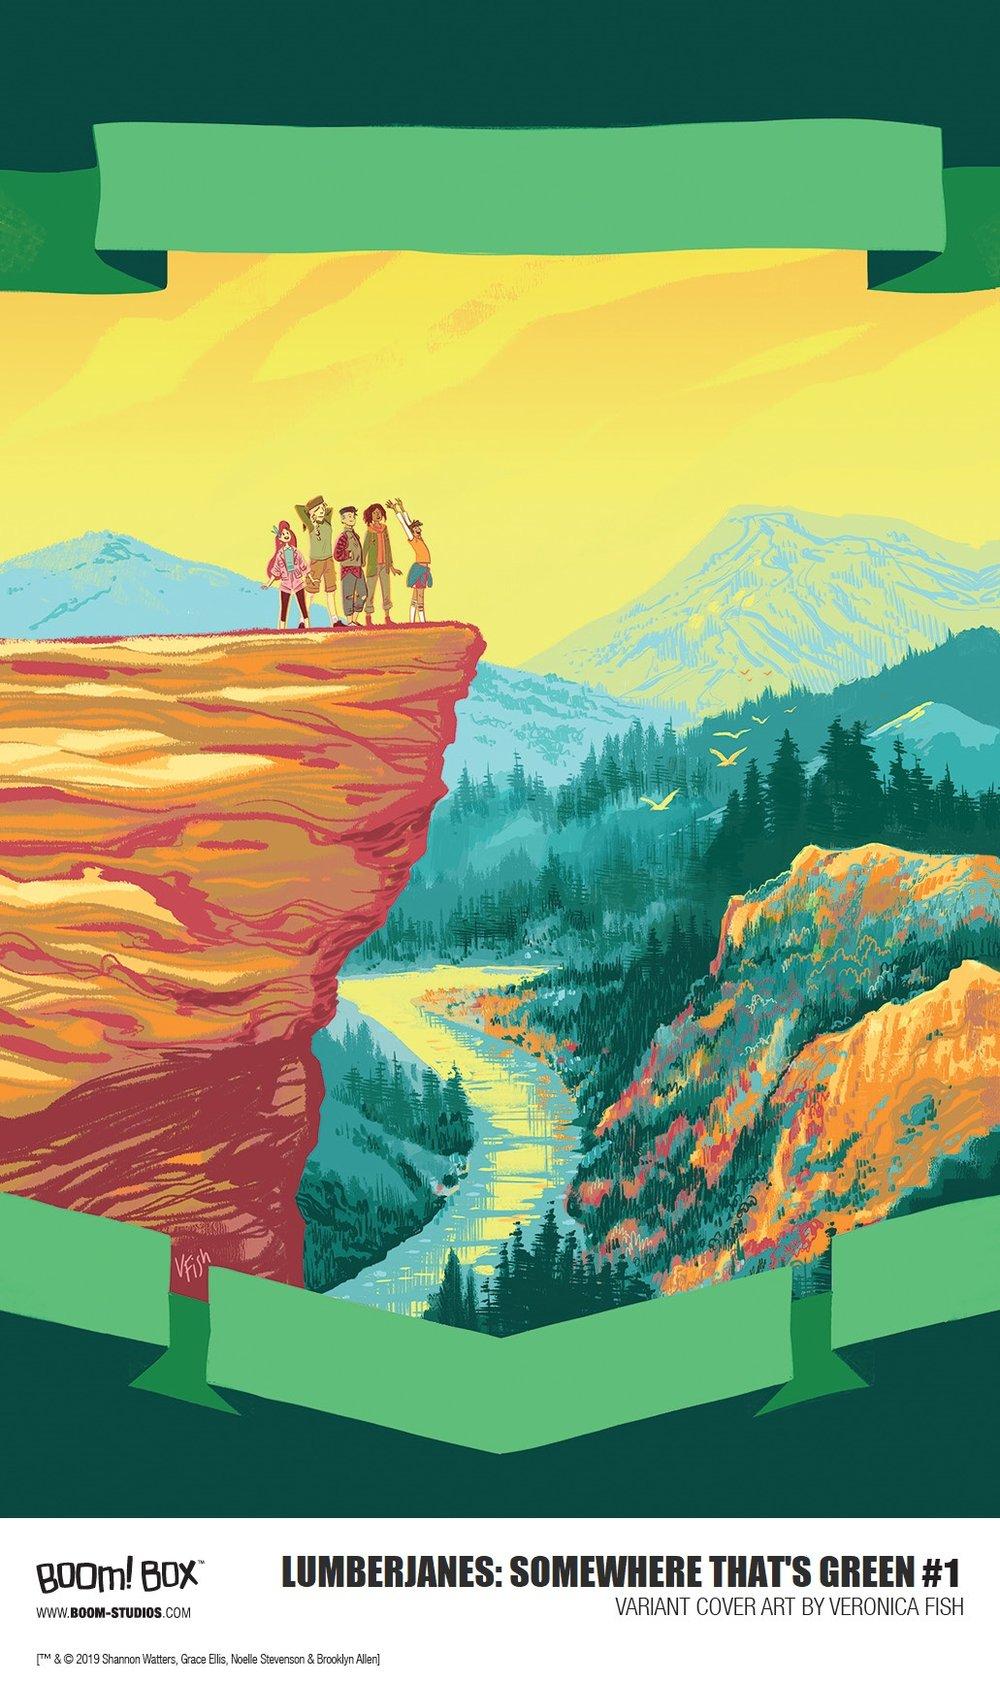 Lumberjanes: Somewhere that's green Alt